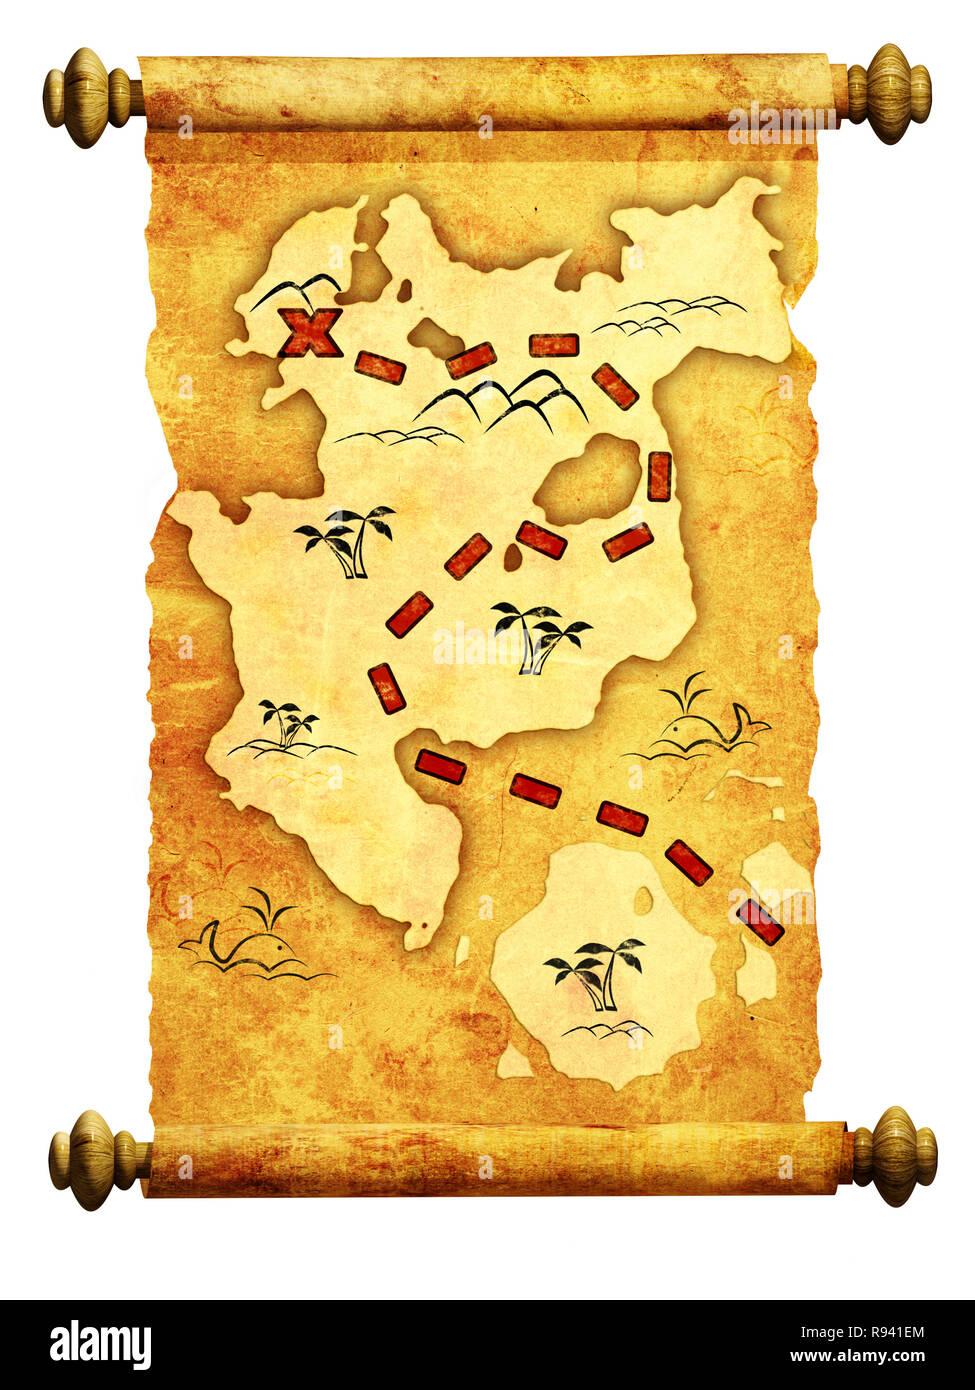 Mapa Pirata Una Forma De Tesoro Foto Imagen De Stock 229355692